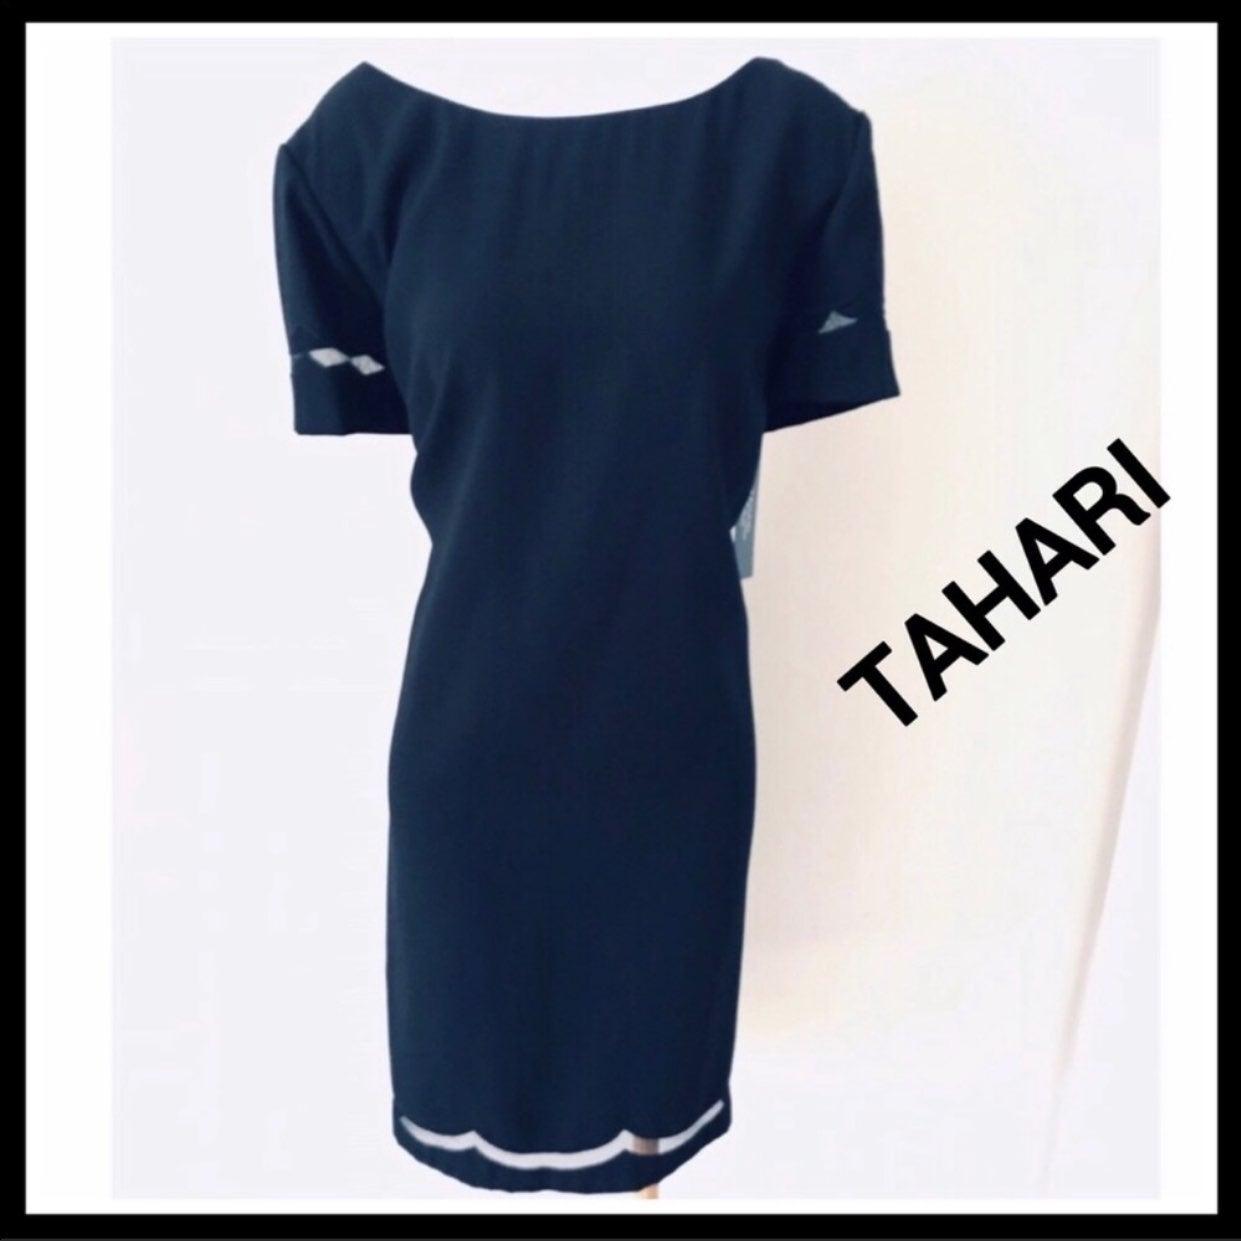 Tahari Arthur S. Levine Dress NWT